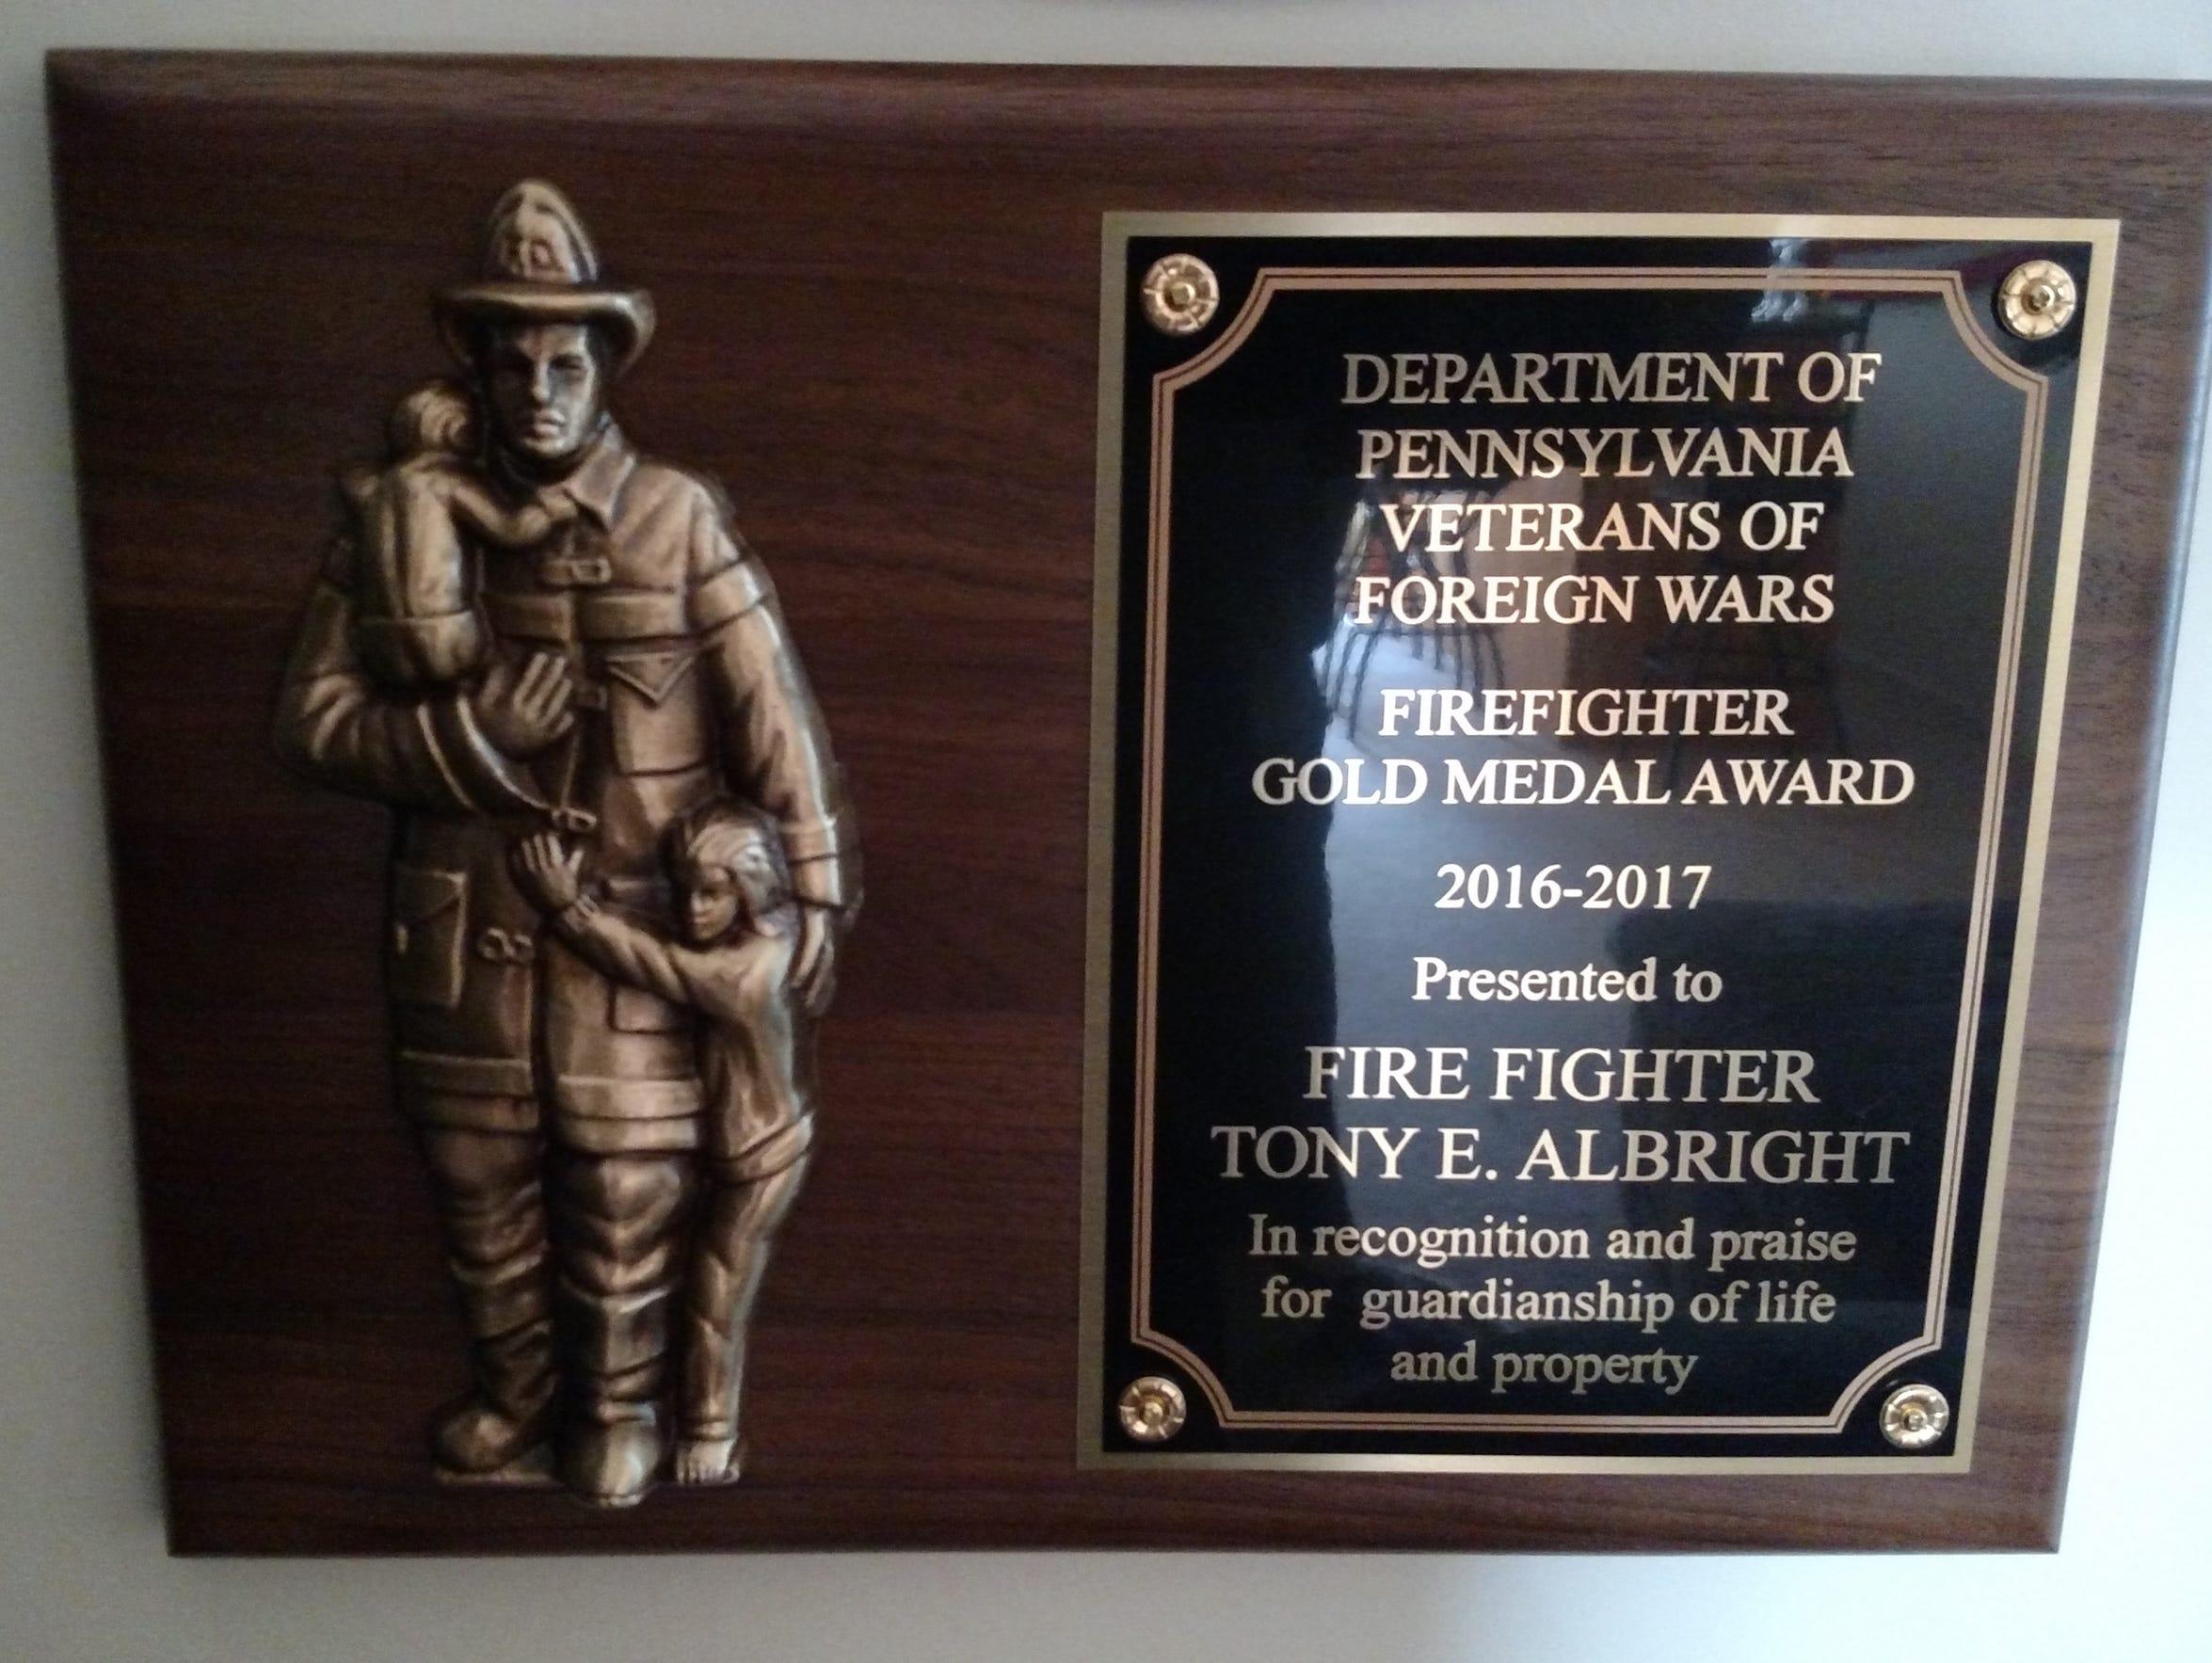 VFW award presented to Firefighter-EMT Tony Albright